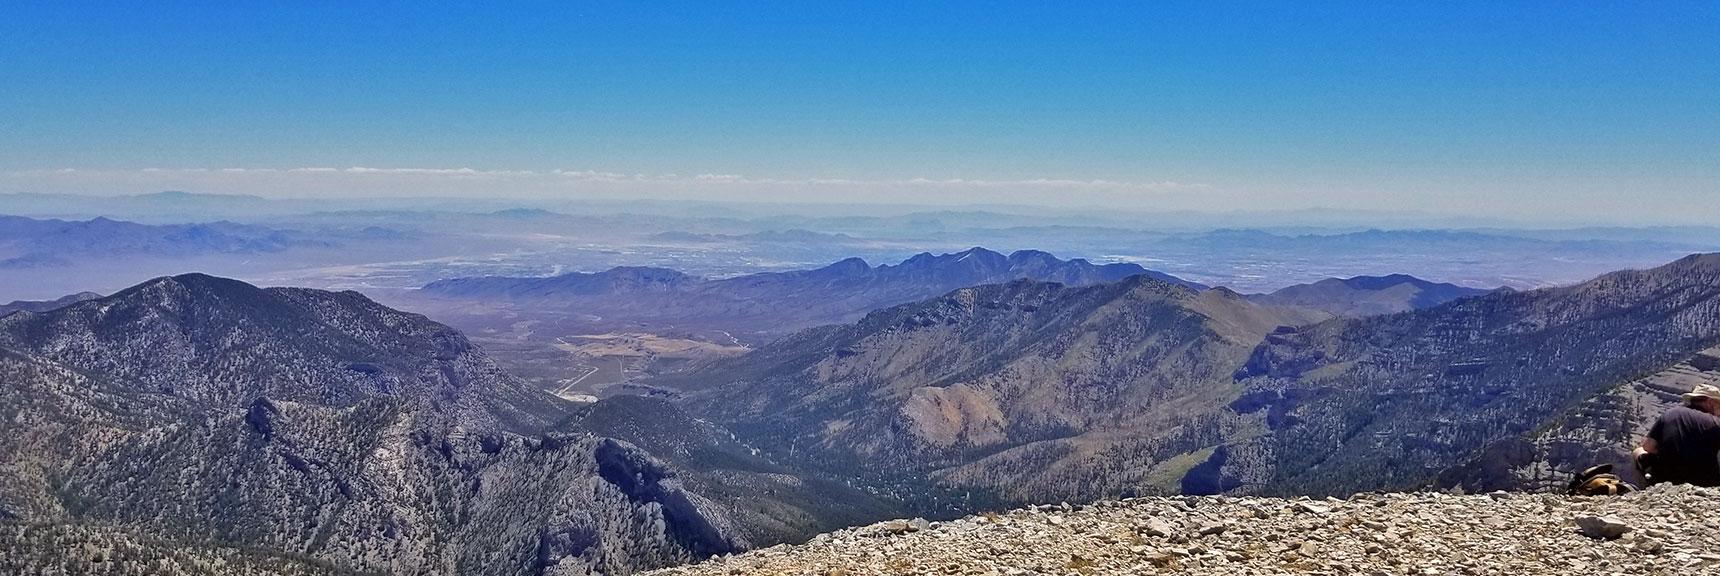 View Down Kyle Canyon from Charleston Peak | Griffith Peak & Charleston Peak Circuit Run, Spring Mountains, Nevada